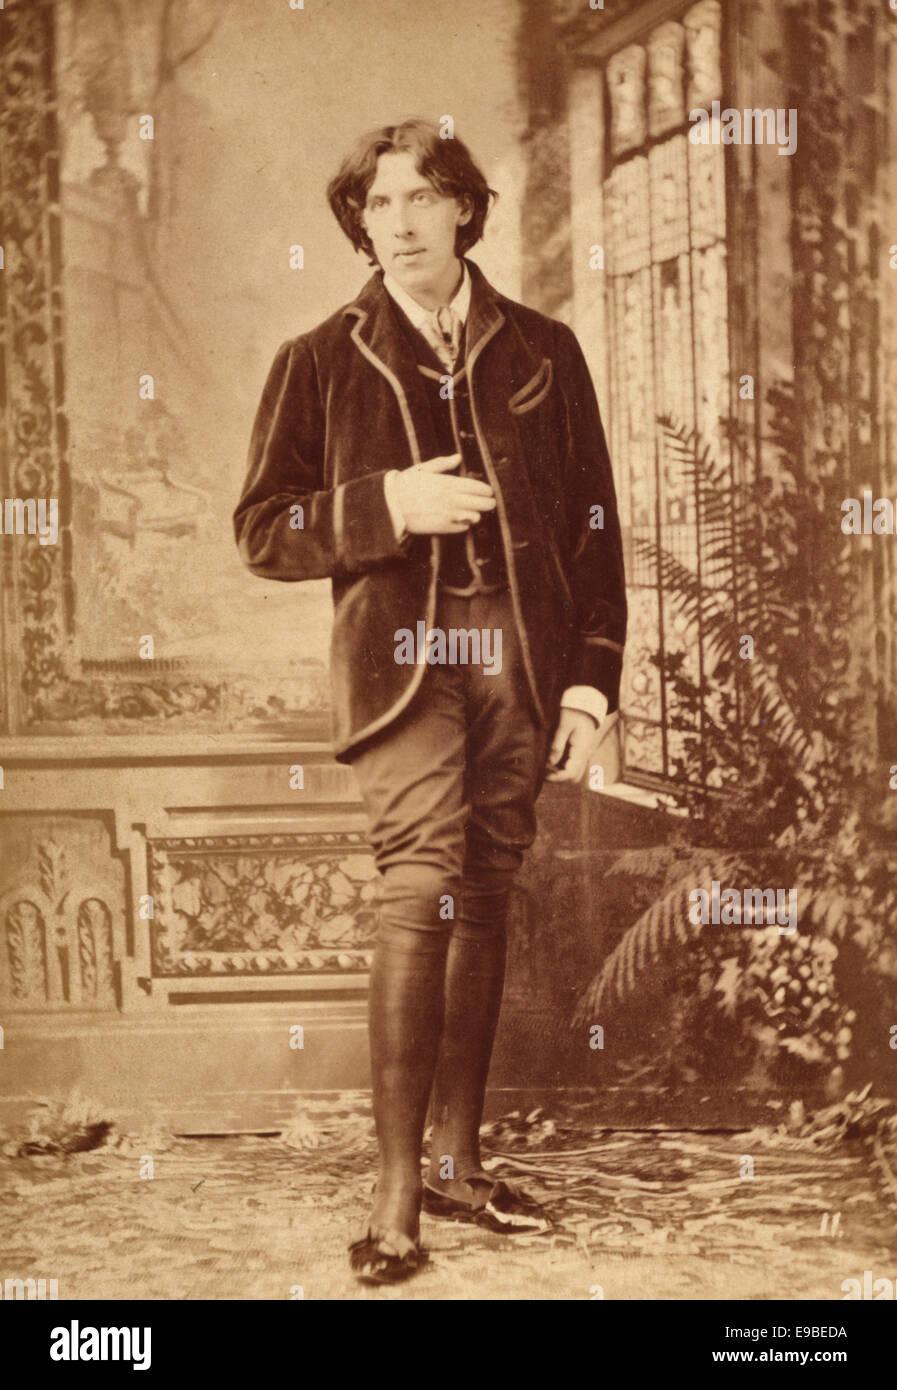 Oscar Wilde Writer Stockfotos & Oscar Wilde Writer Bilder - Alamy